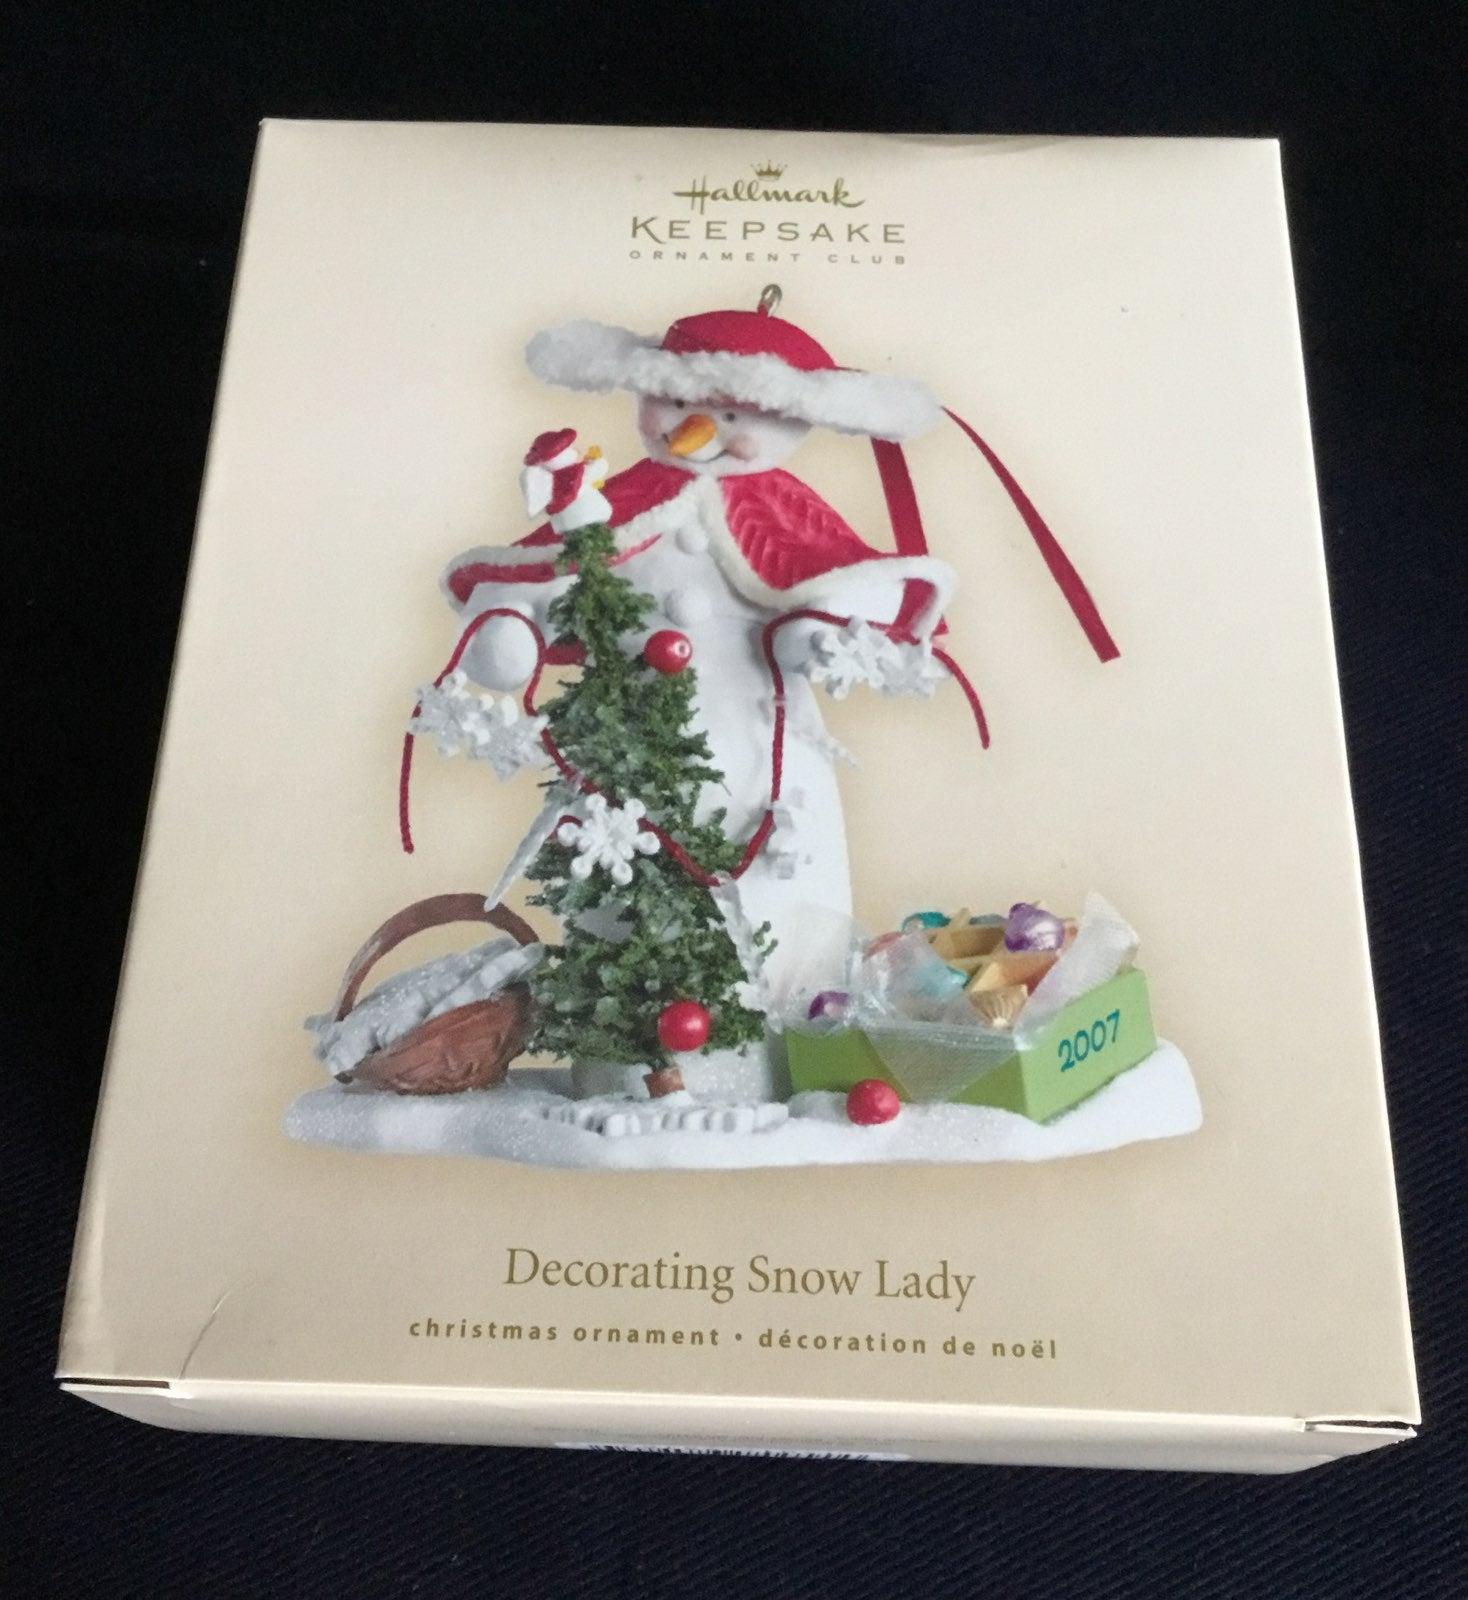 Hallmark Keepsake - Decorating Snow Lady